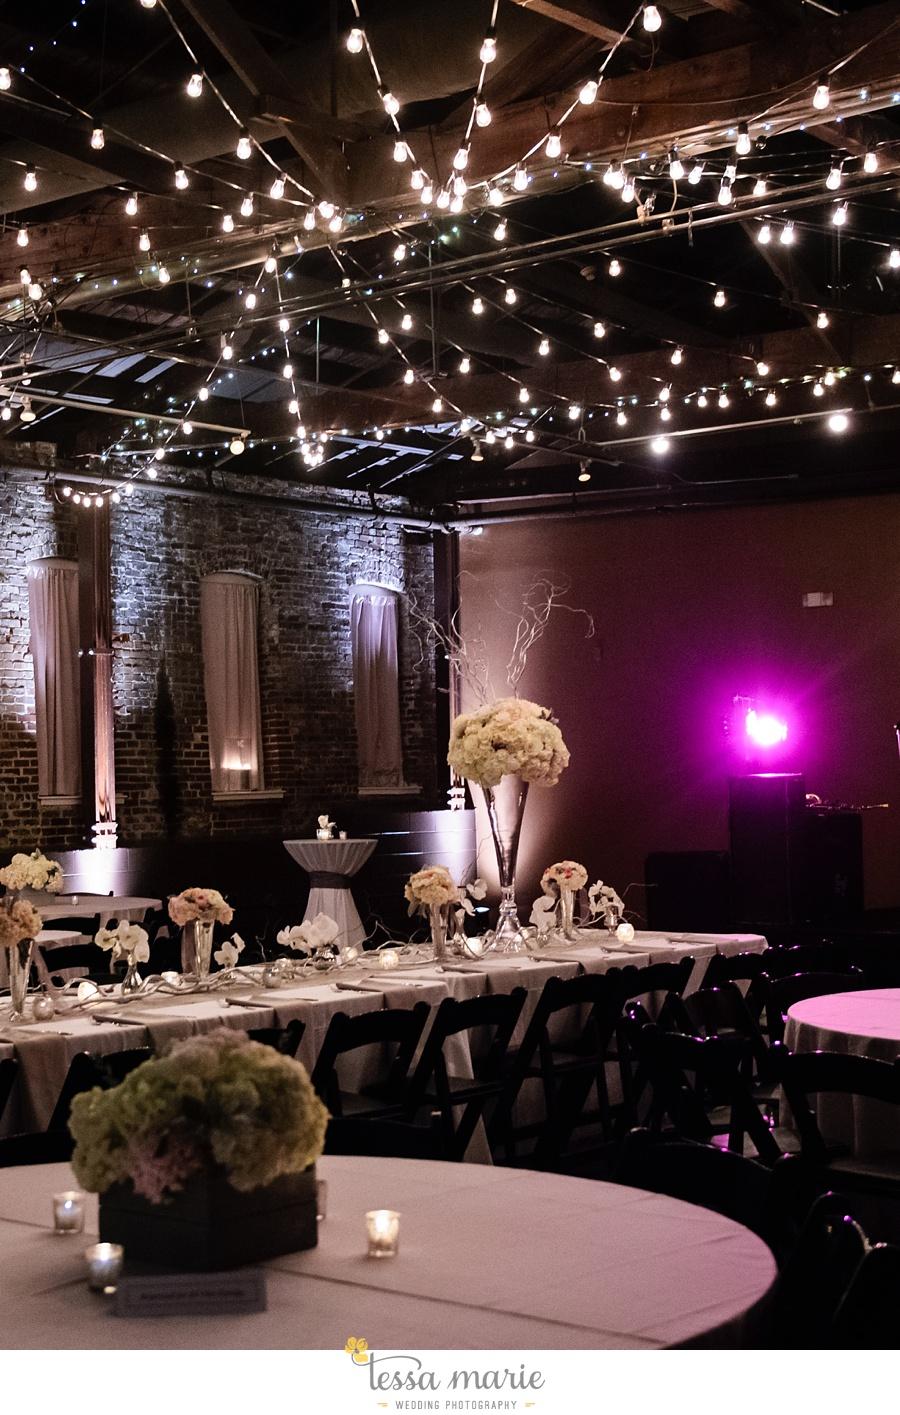 290_tessa_marie_weddings_emotional_moments_photography_king_low_wedding_sam_neil_best_atlanta_wedding_photographer